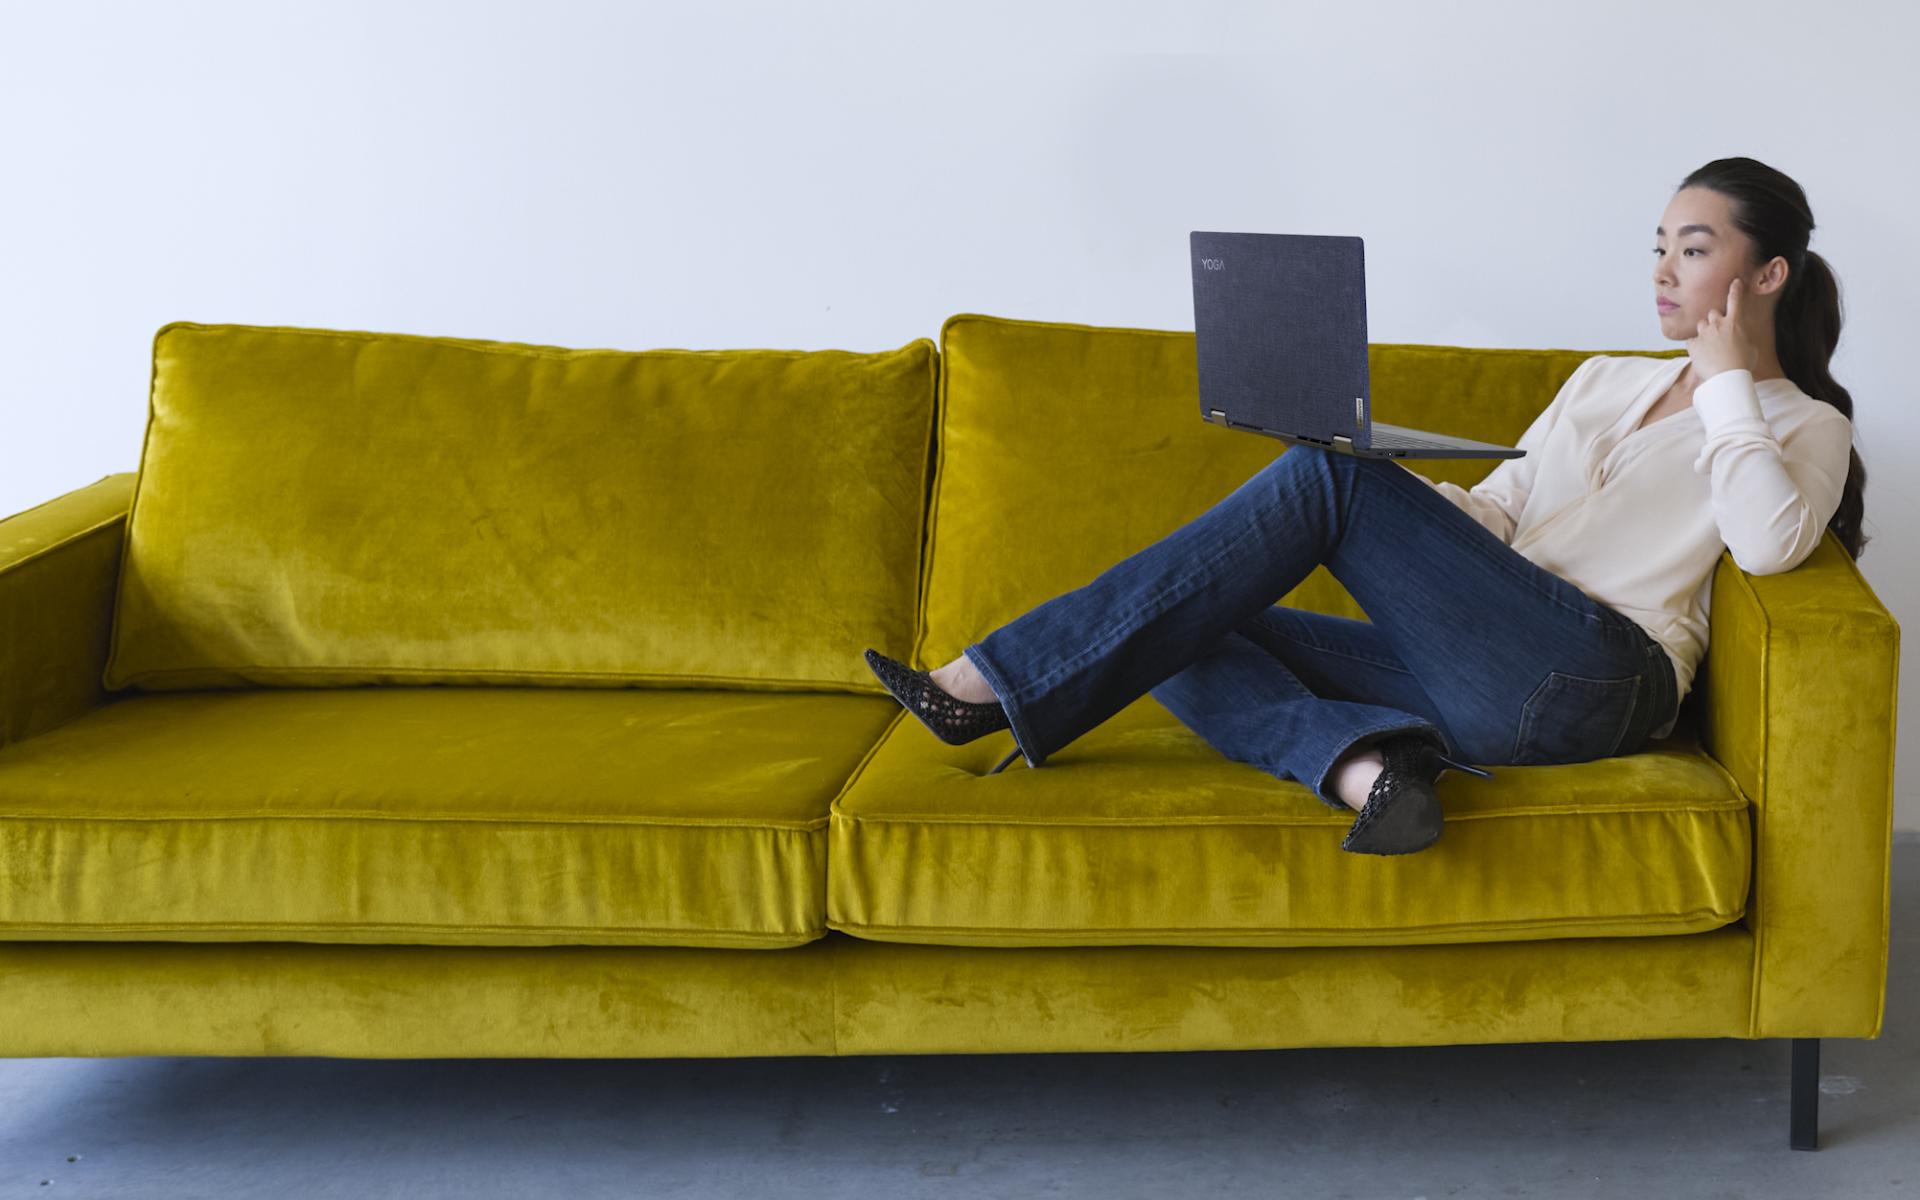 Lenovo's Latest Range Of Yoga Laptops Are For All Of Us